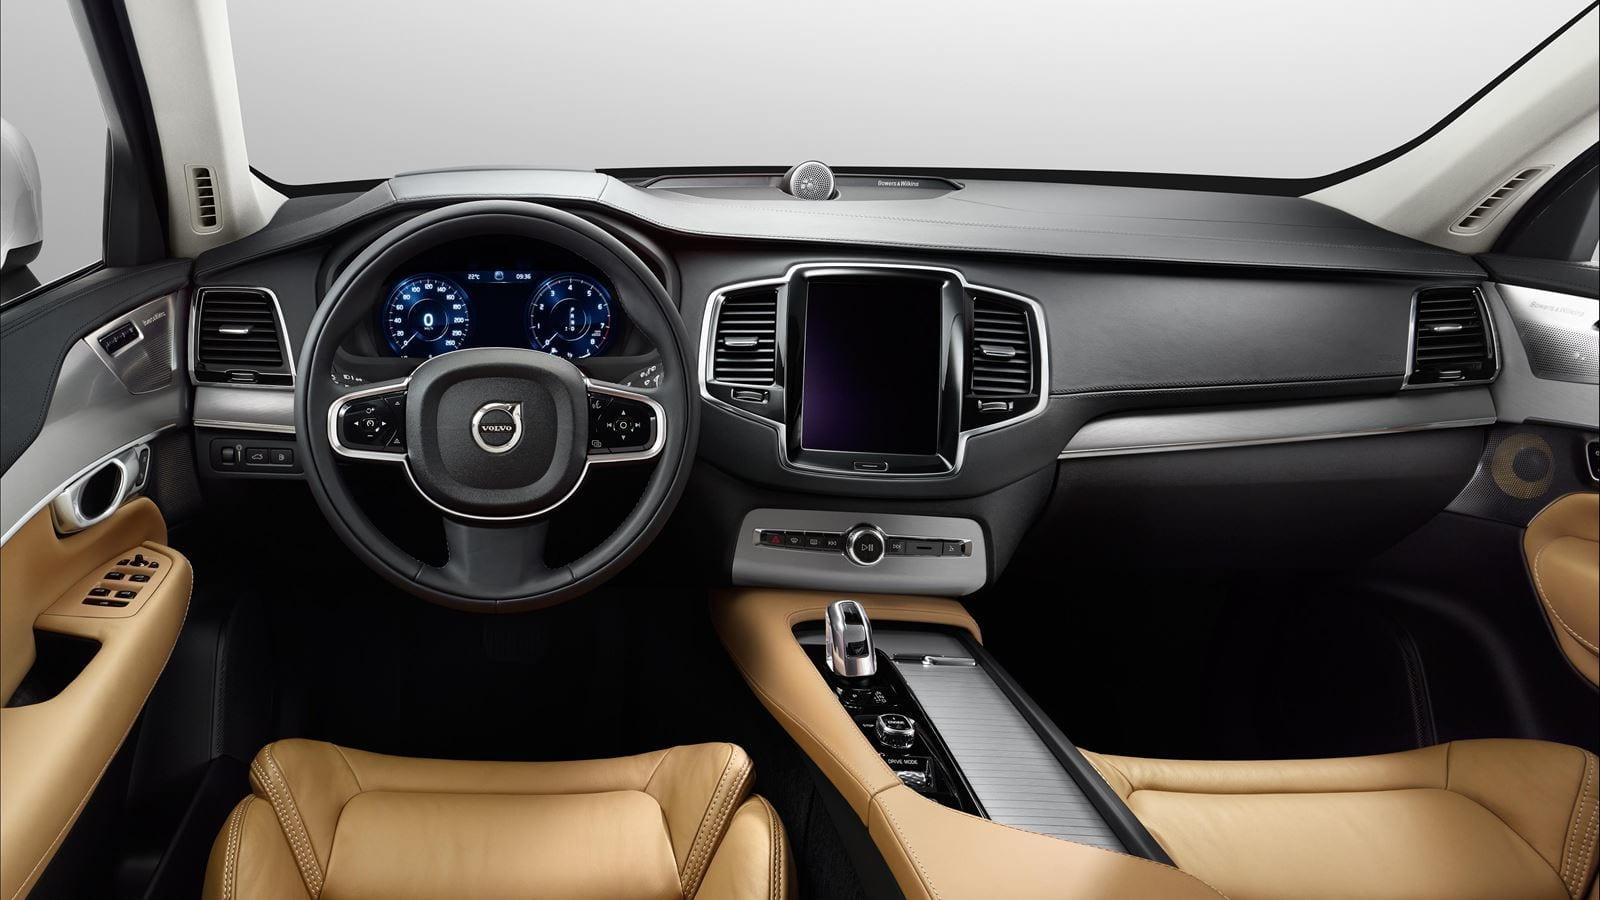 2017 Volvo Xc90 Hybrid Front Tan And Black Interior